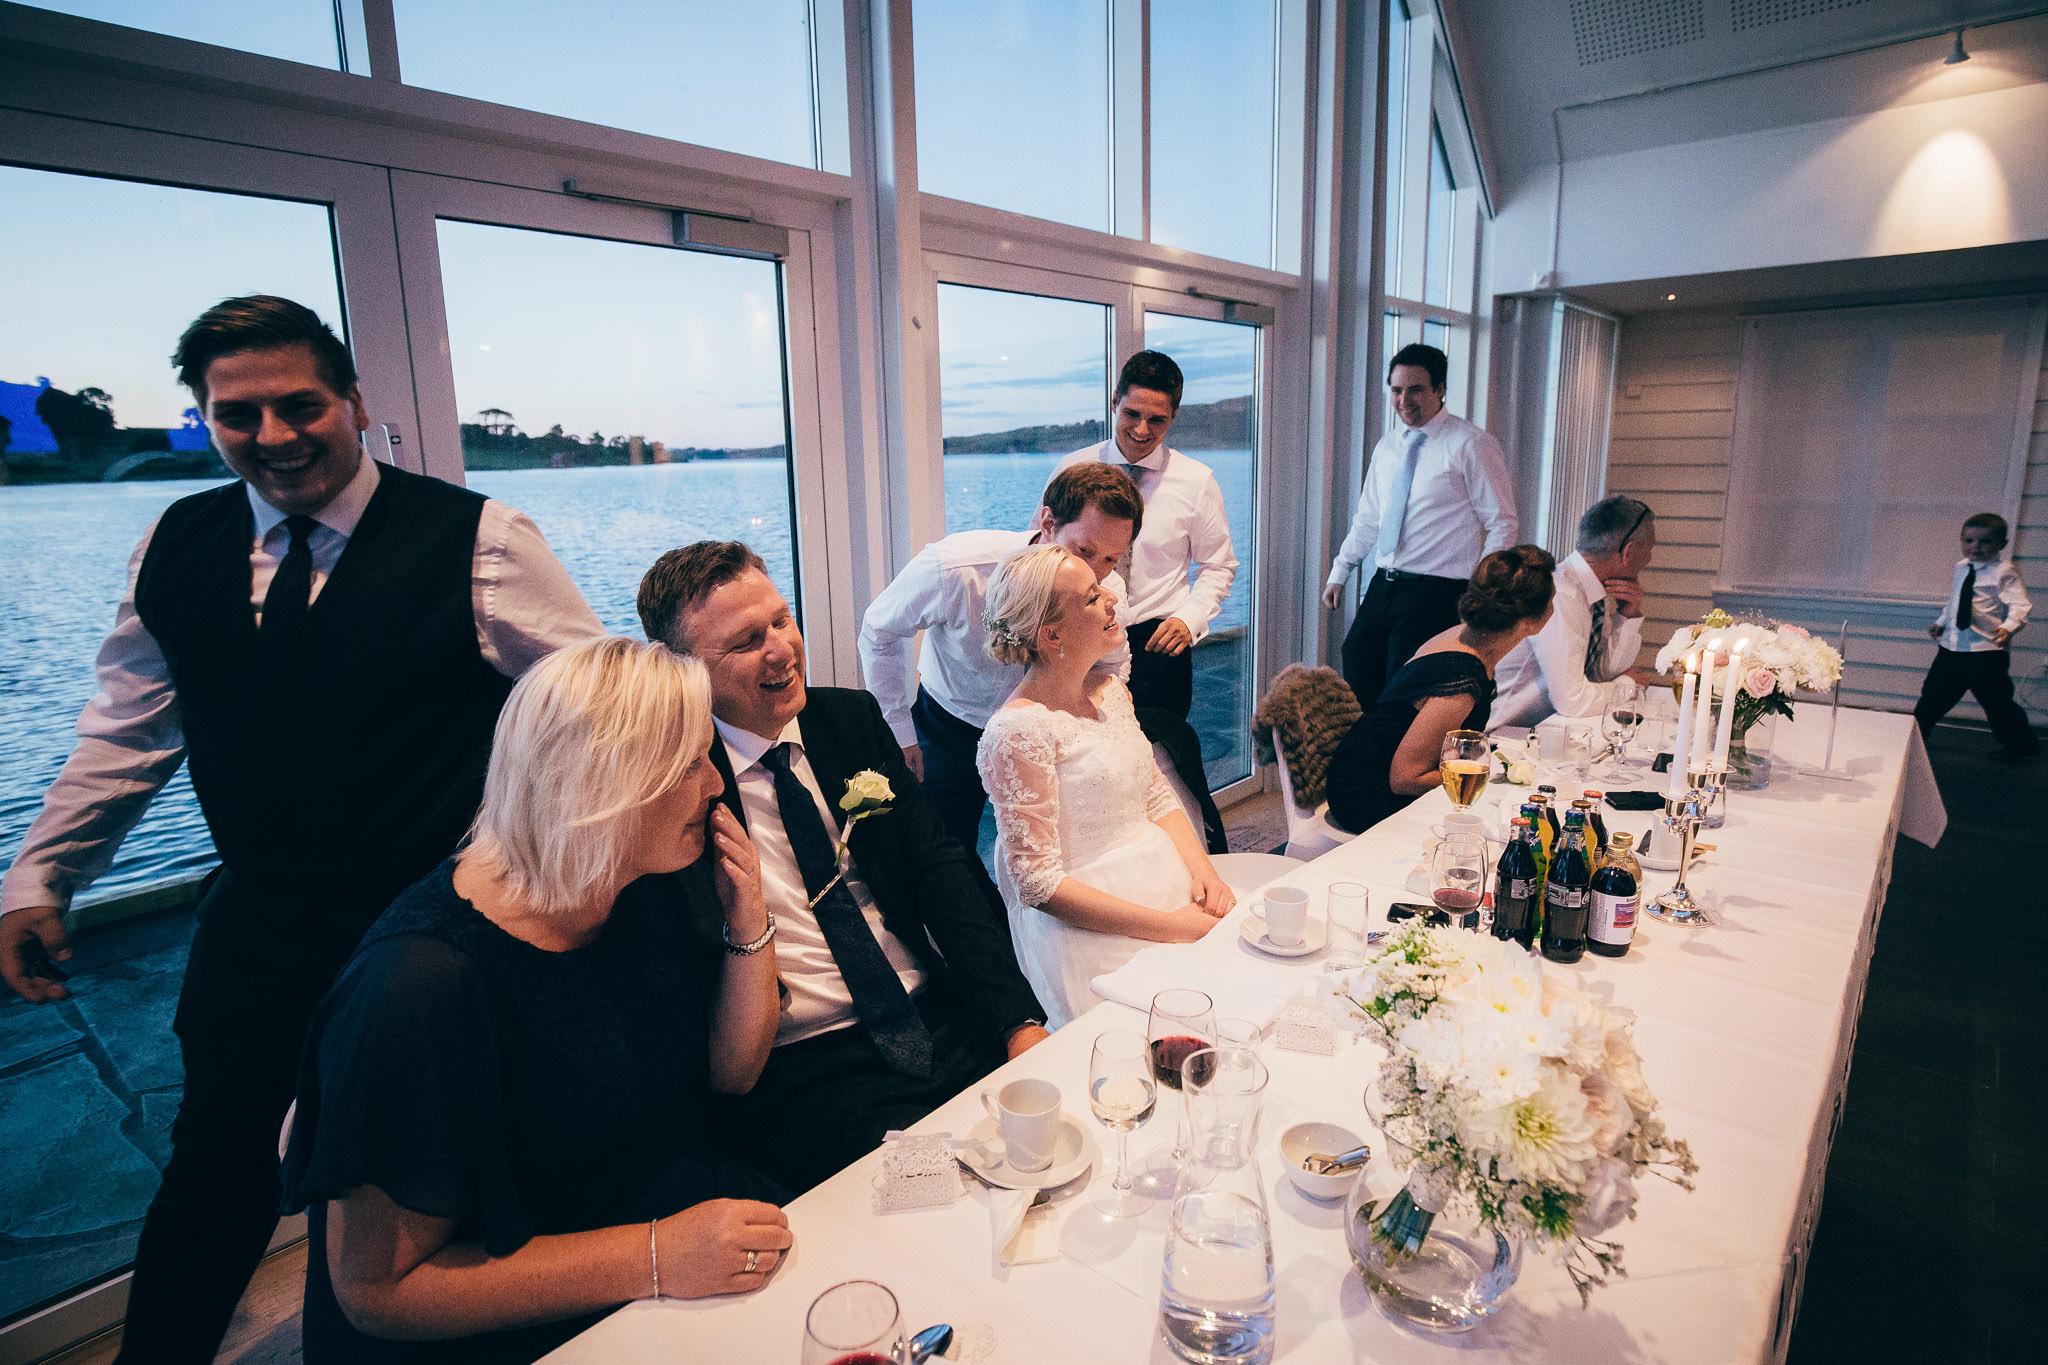 Wedding+Photographer+Norway+Bryllupsfotograf+Casey+Arneson+JT-184.jpg